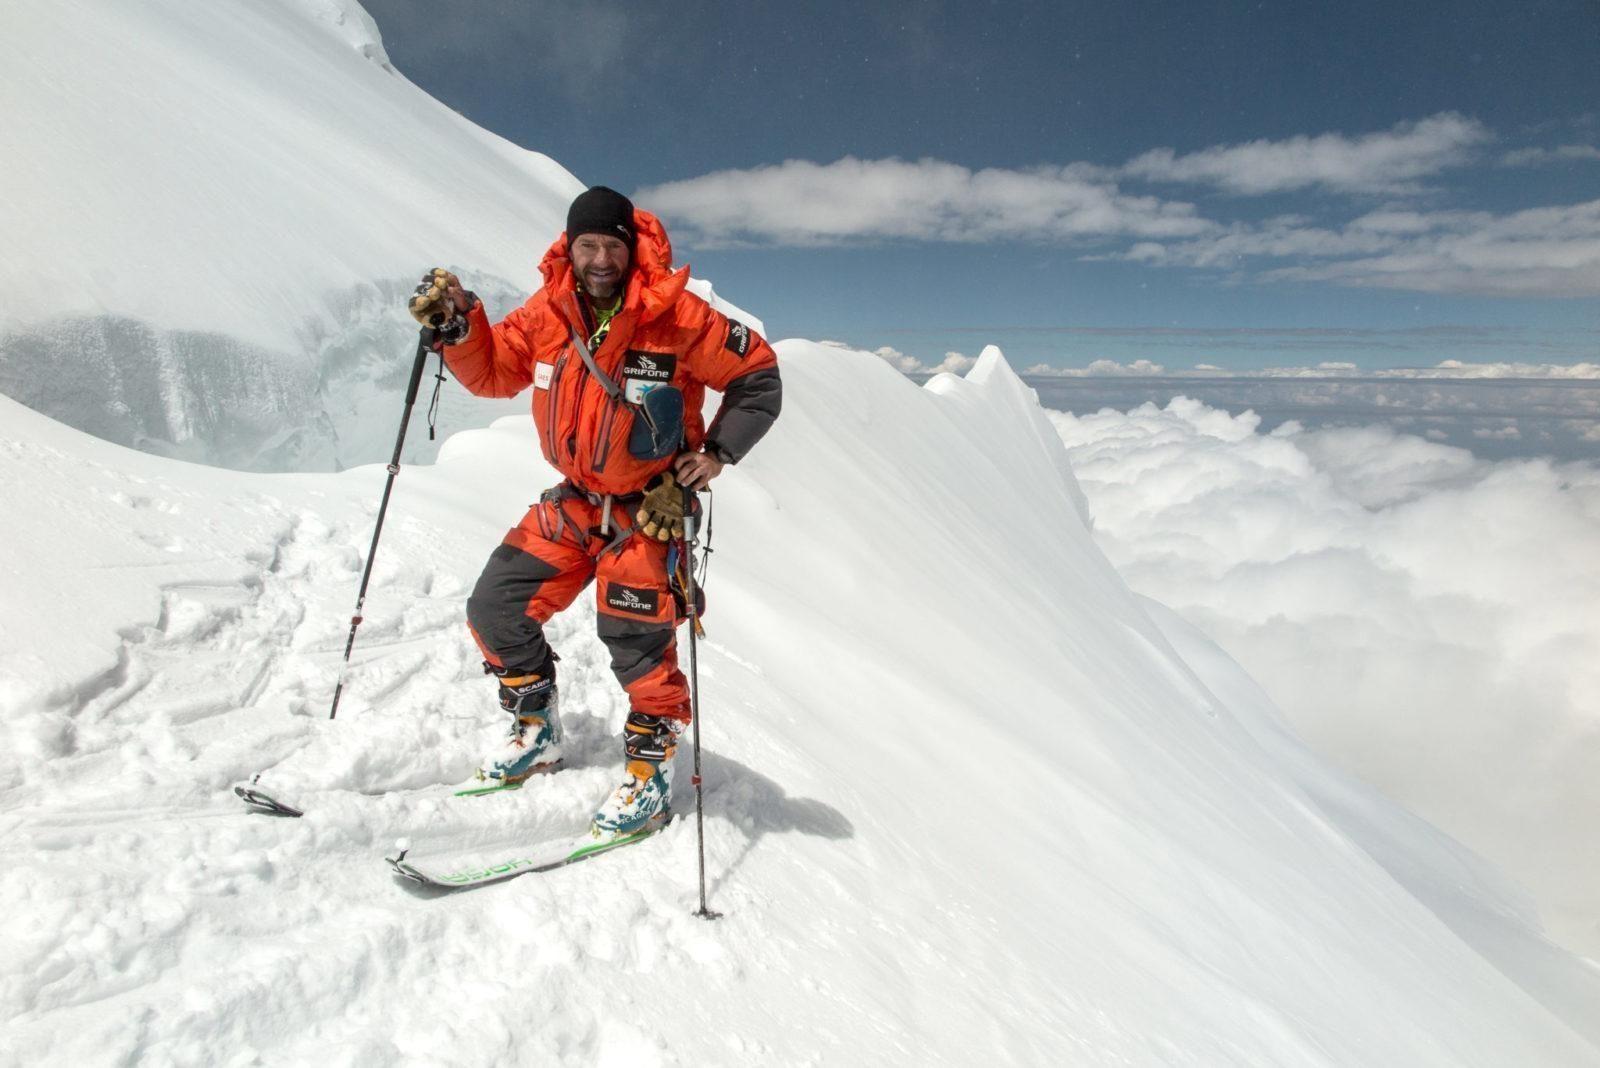 Campus esquí de muntanya Ferran Latorre